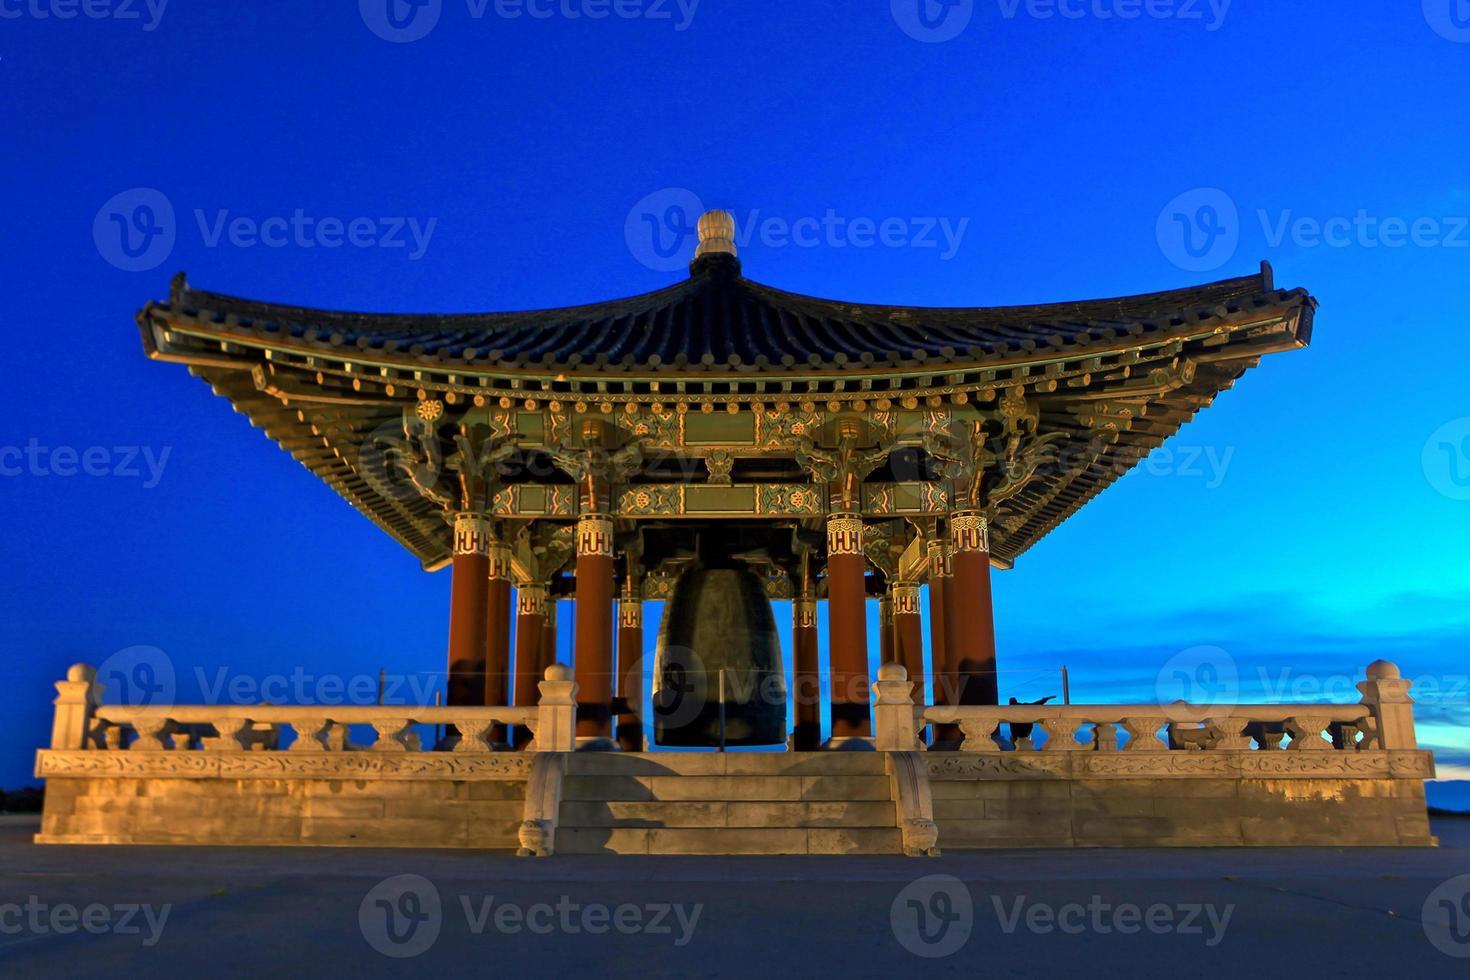 toeristenmonument Koreaanse vriendschapsbel in san pedro, cailfornia foto